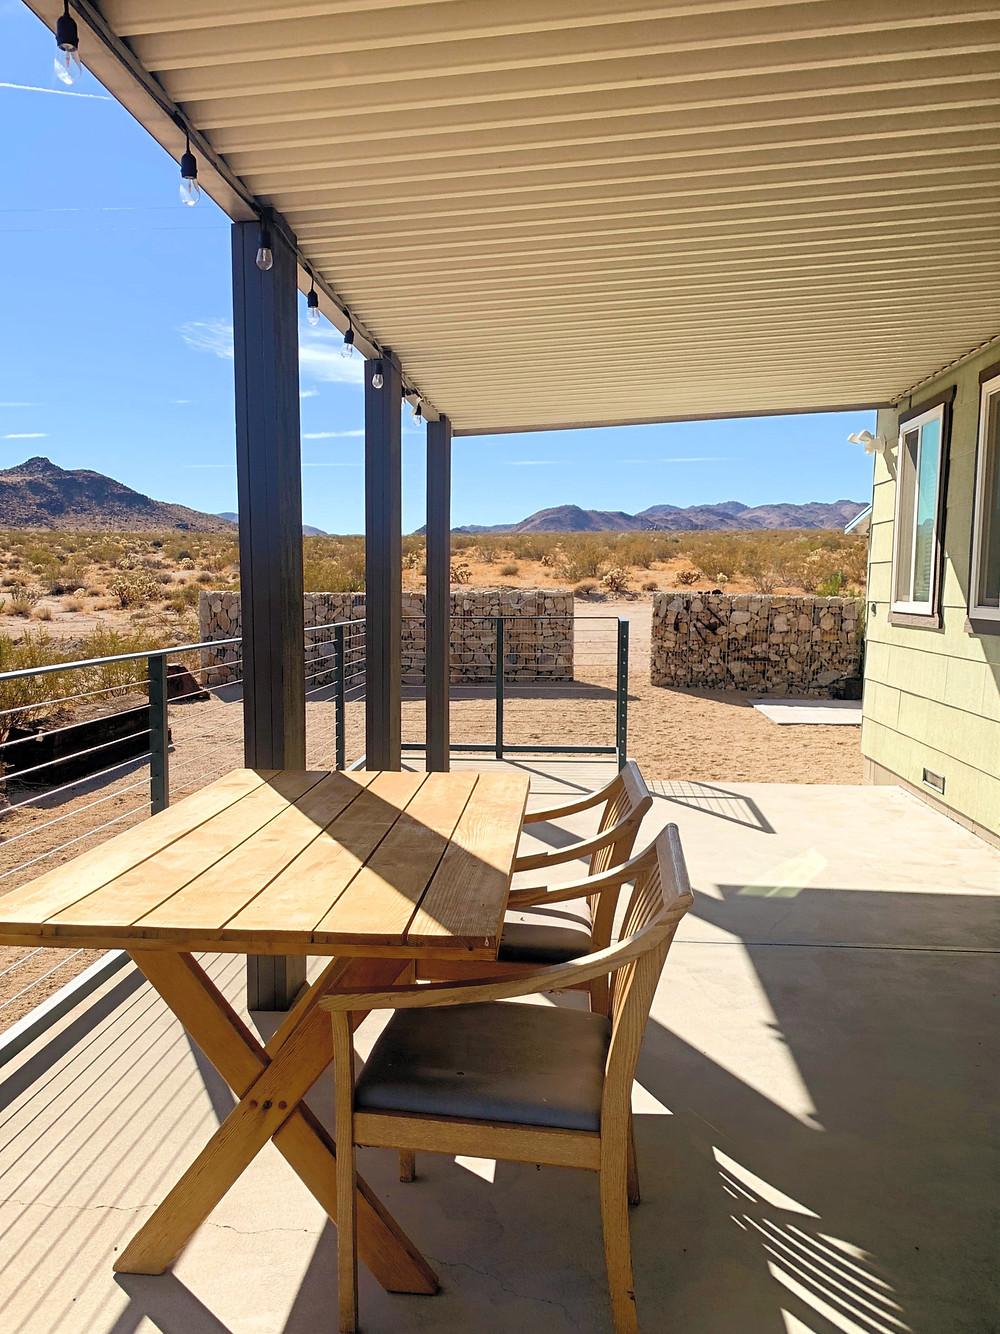 Joshua Tree Twenty Nine Palms Airbnb in the desert